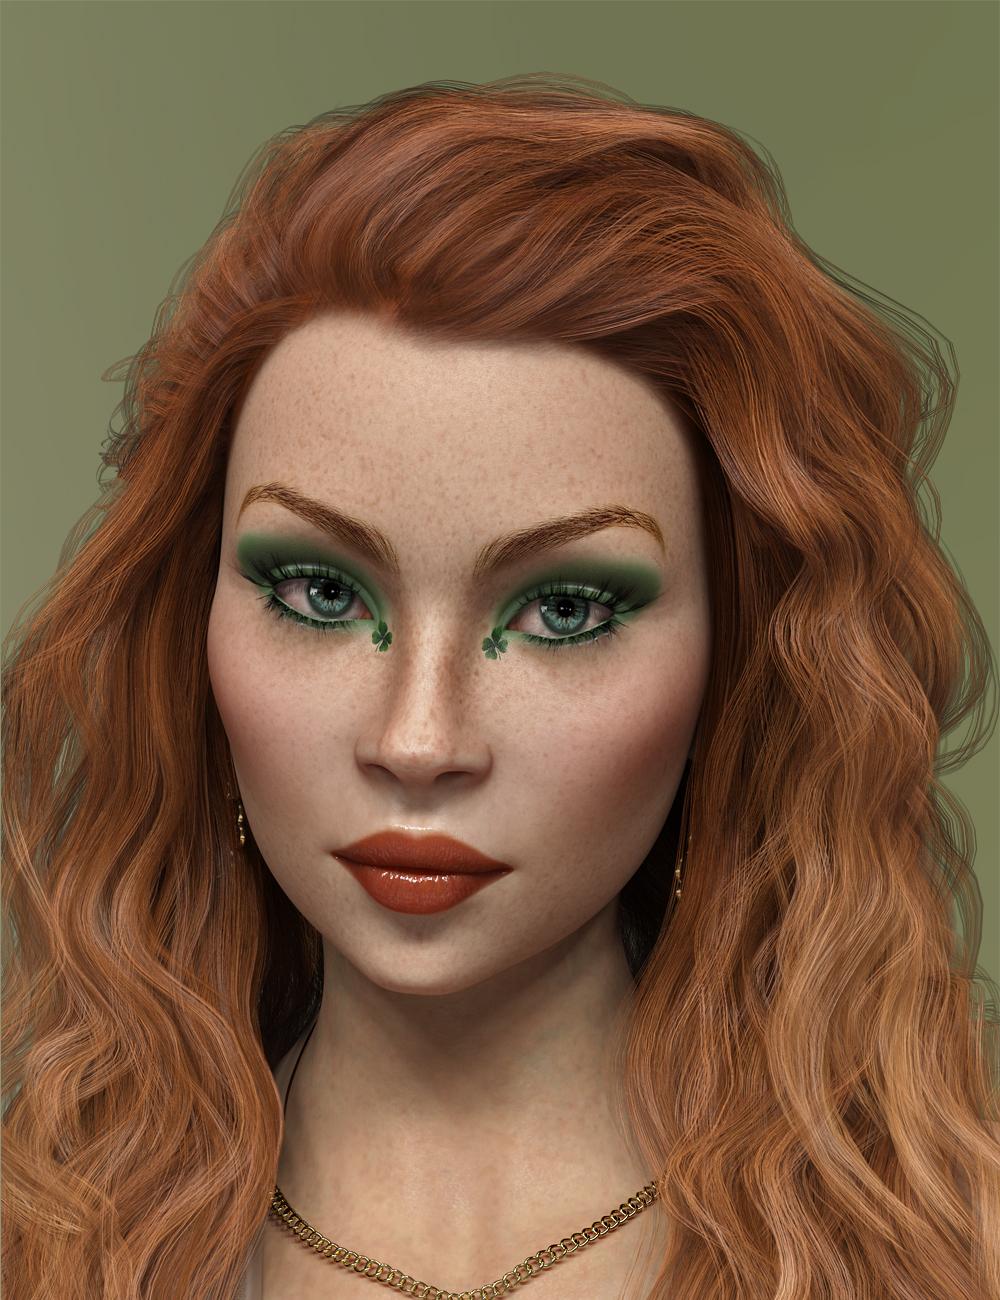 Madeline for Genesis 8 Female by: TwiztedMetal, 3D Models by Daz 3D